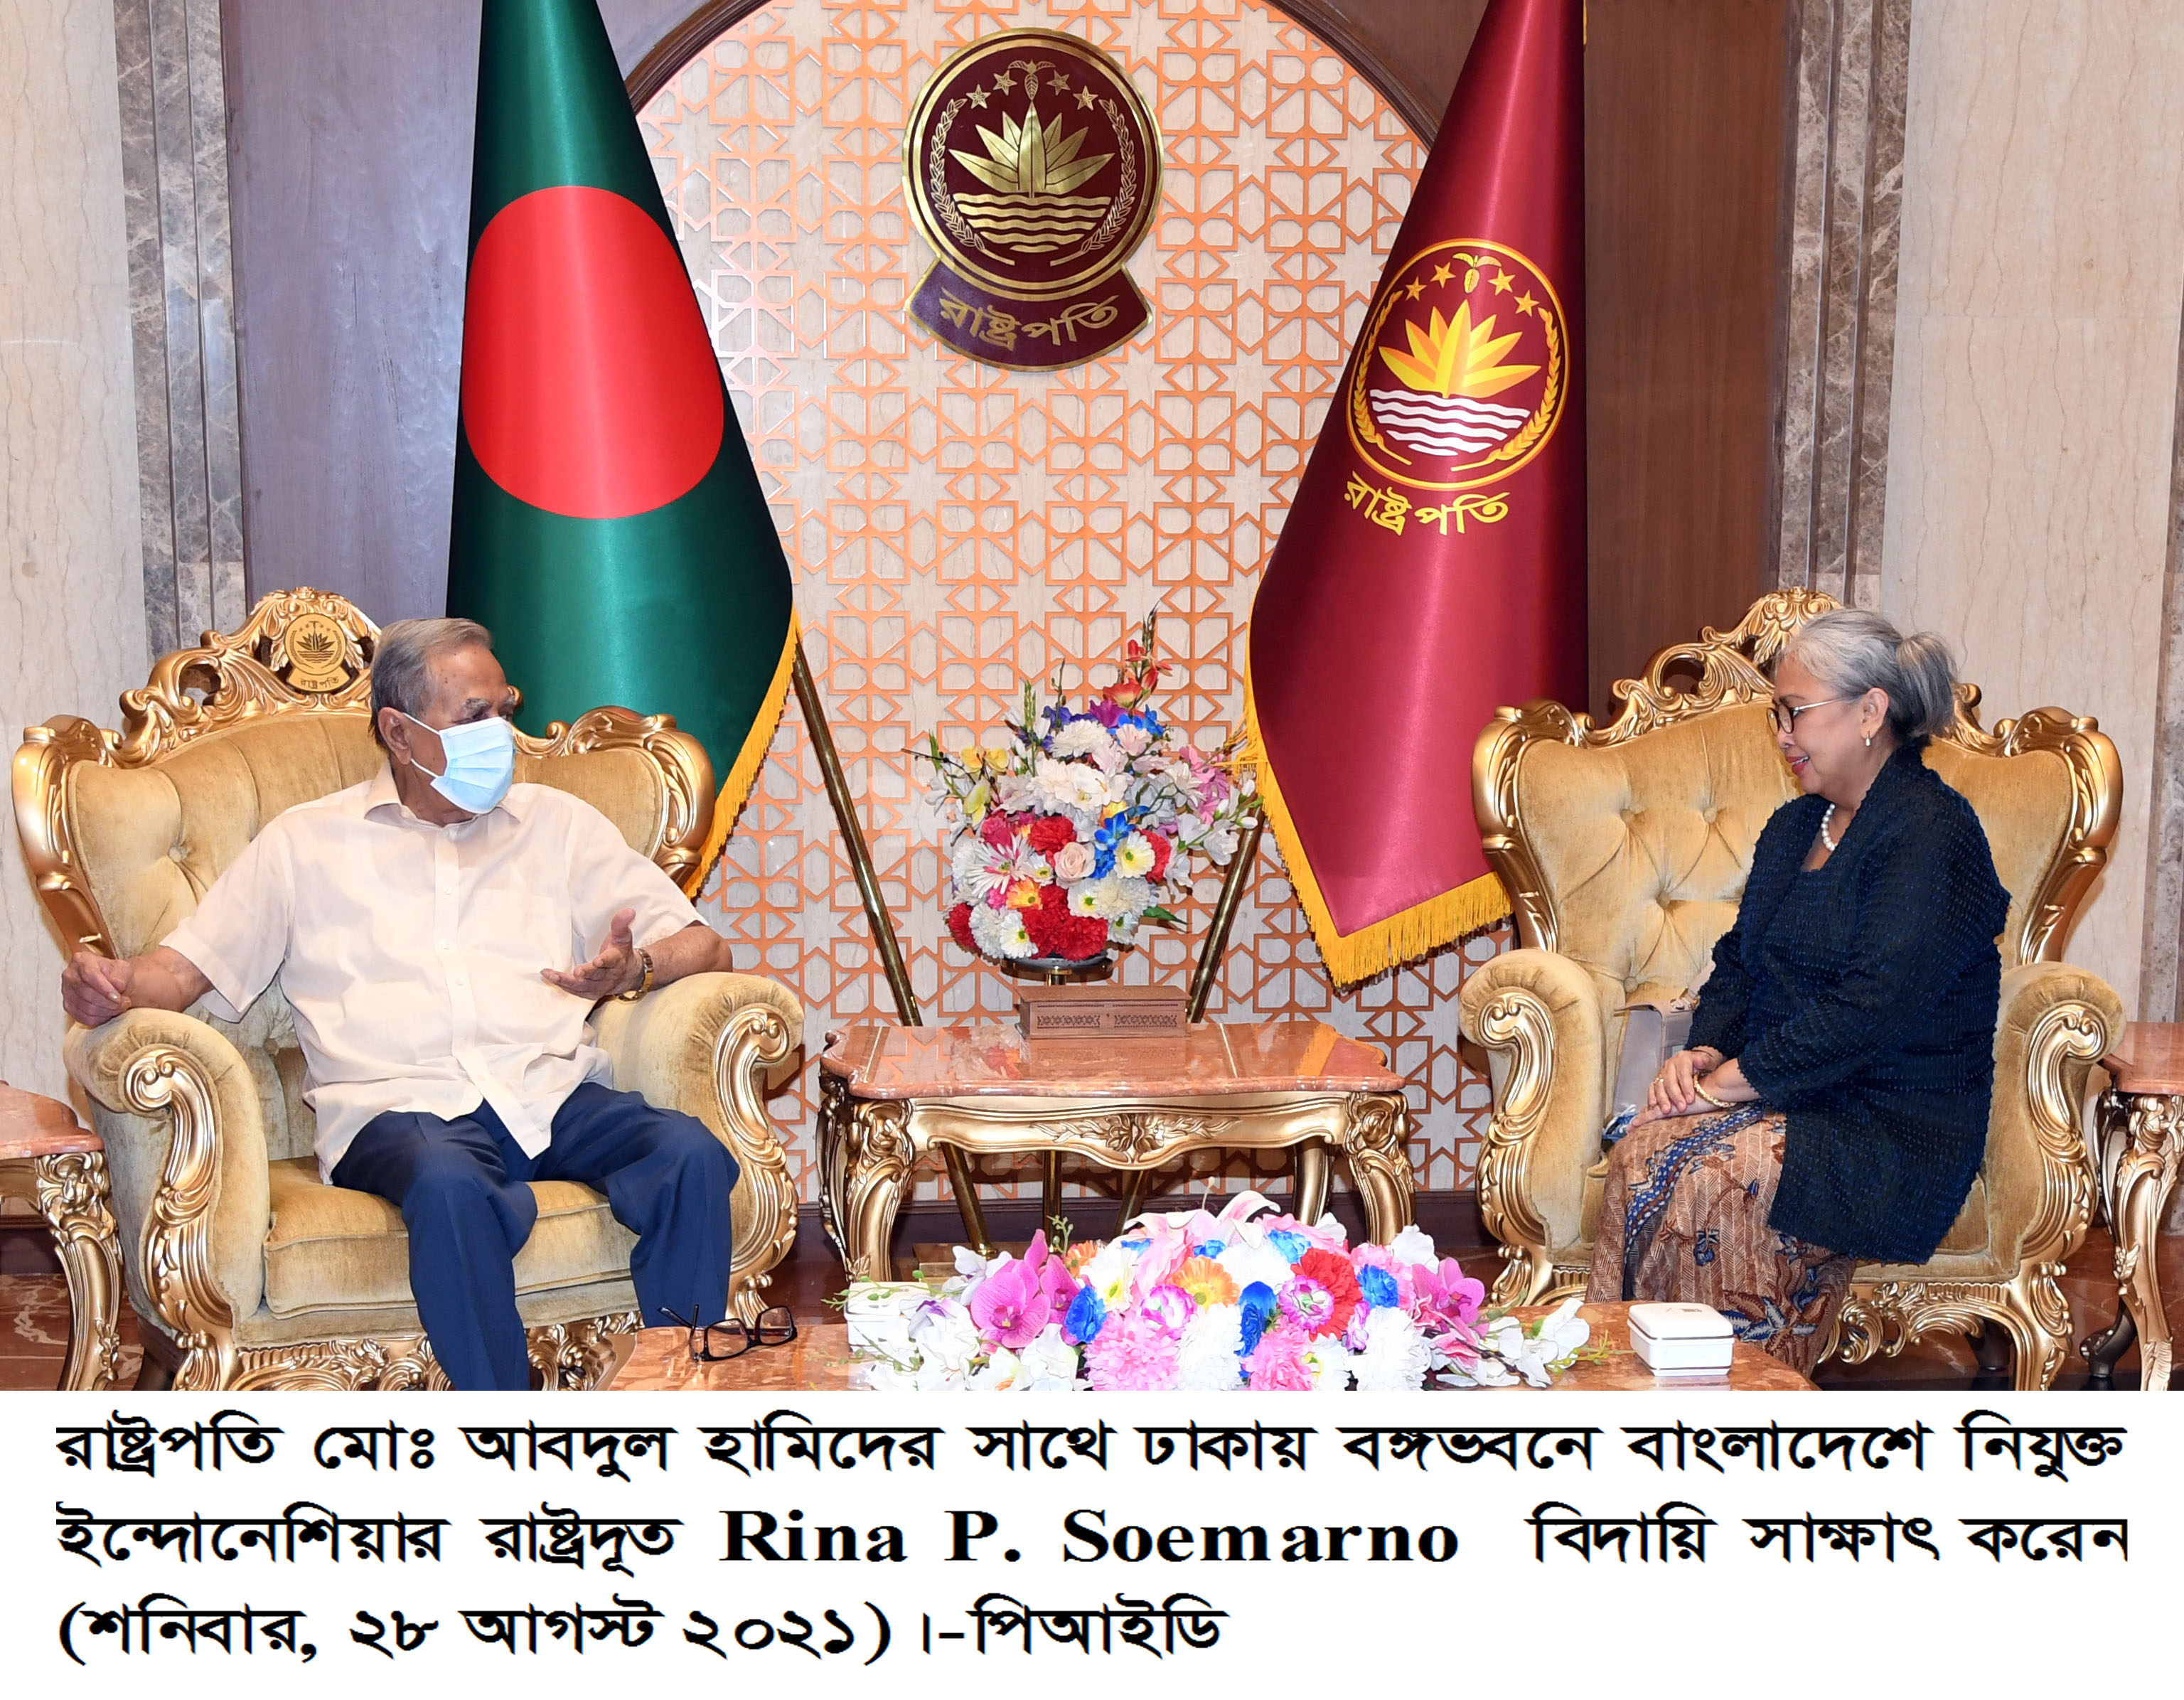 Indonesia envoy meets Bangladesh president